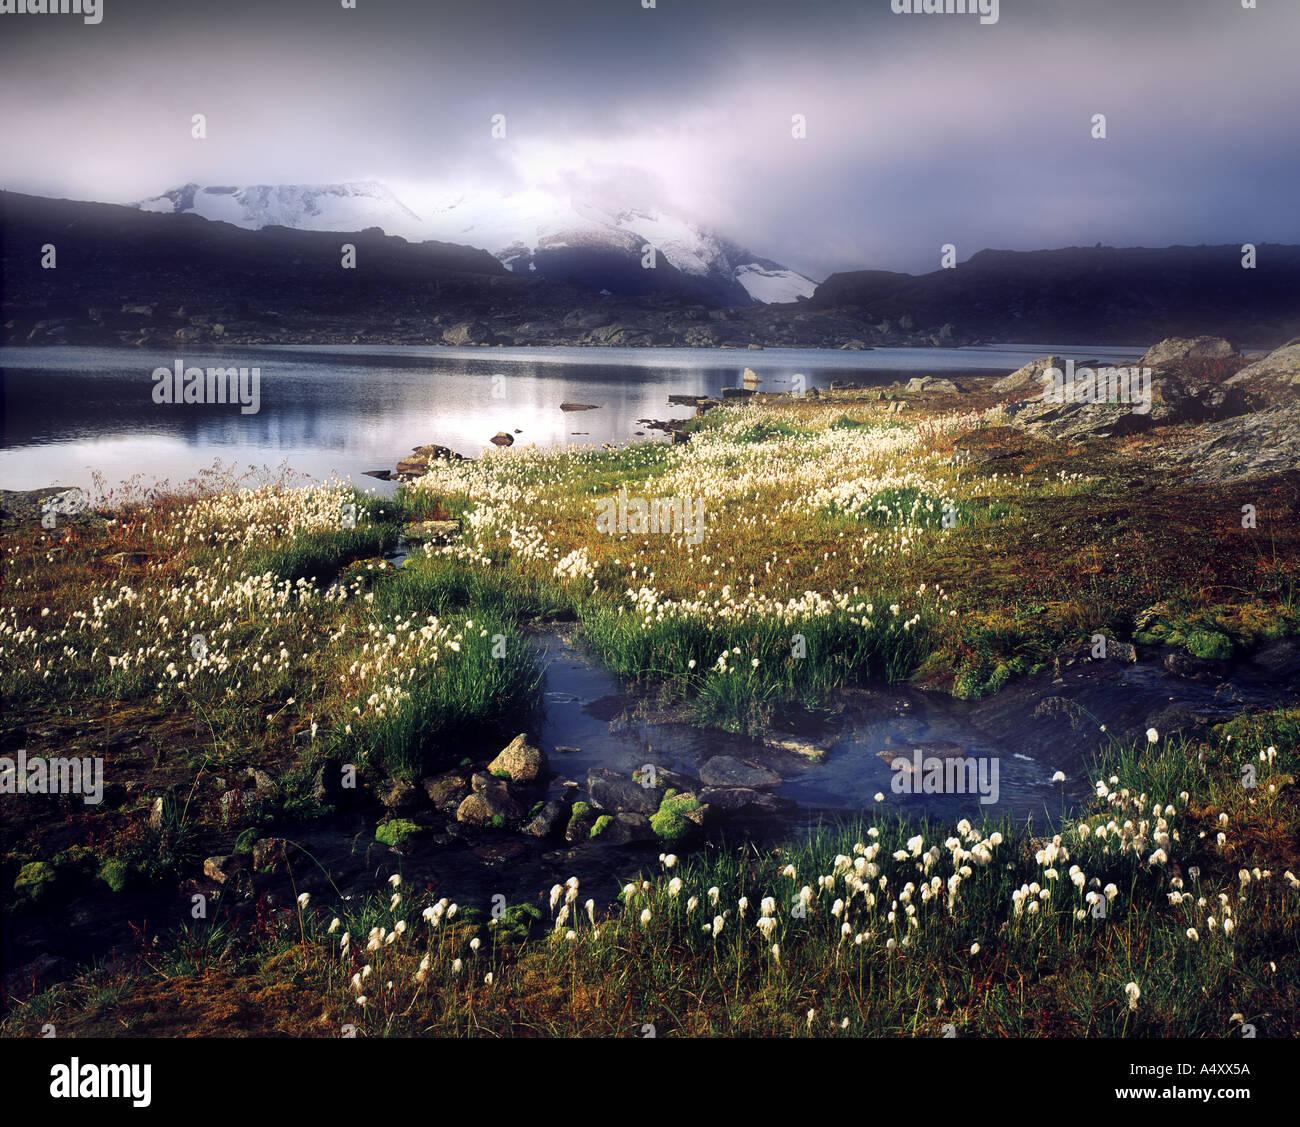 FI - NORTHERN LAPLAND: Moorlands near Kiruna - Stock Image